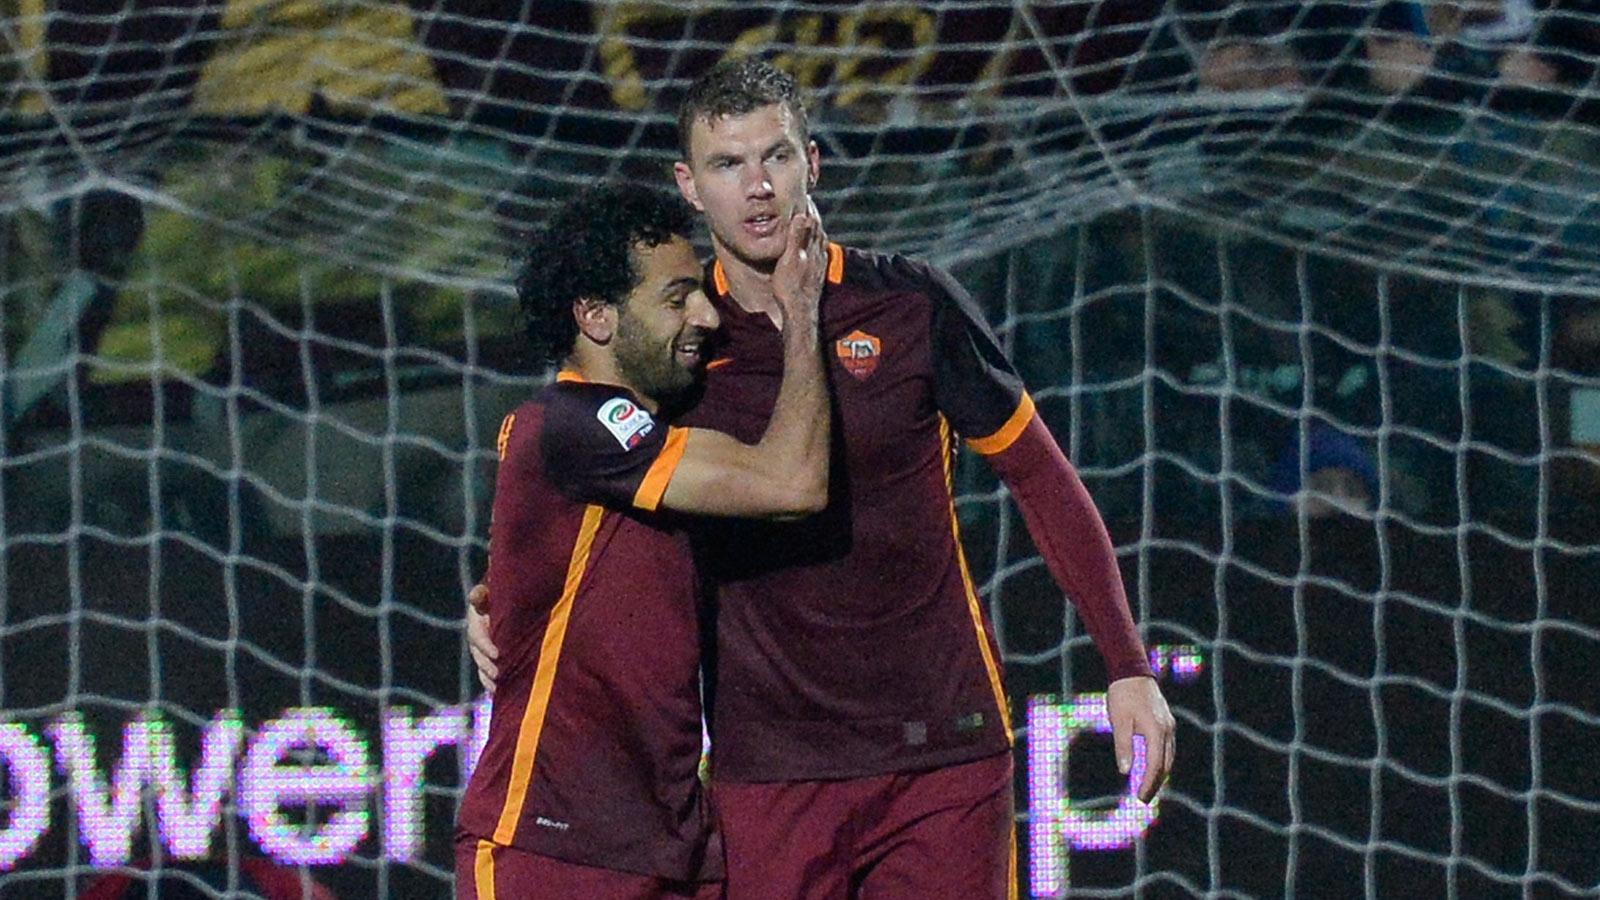 Edin Dzeko ends scoring drought as Roma knock off Carpi